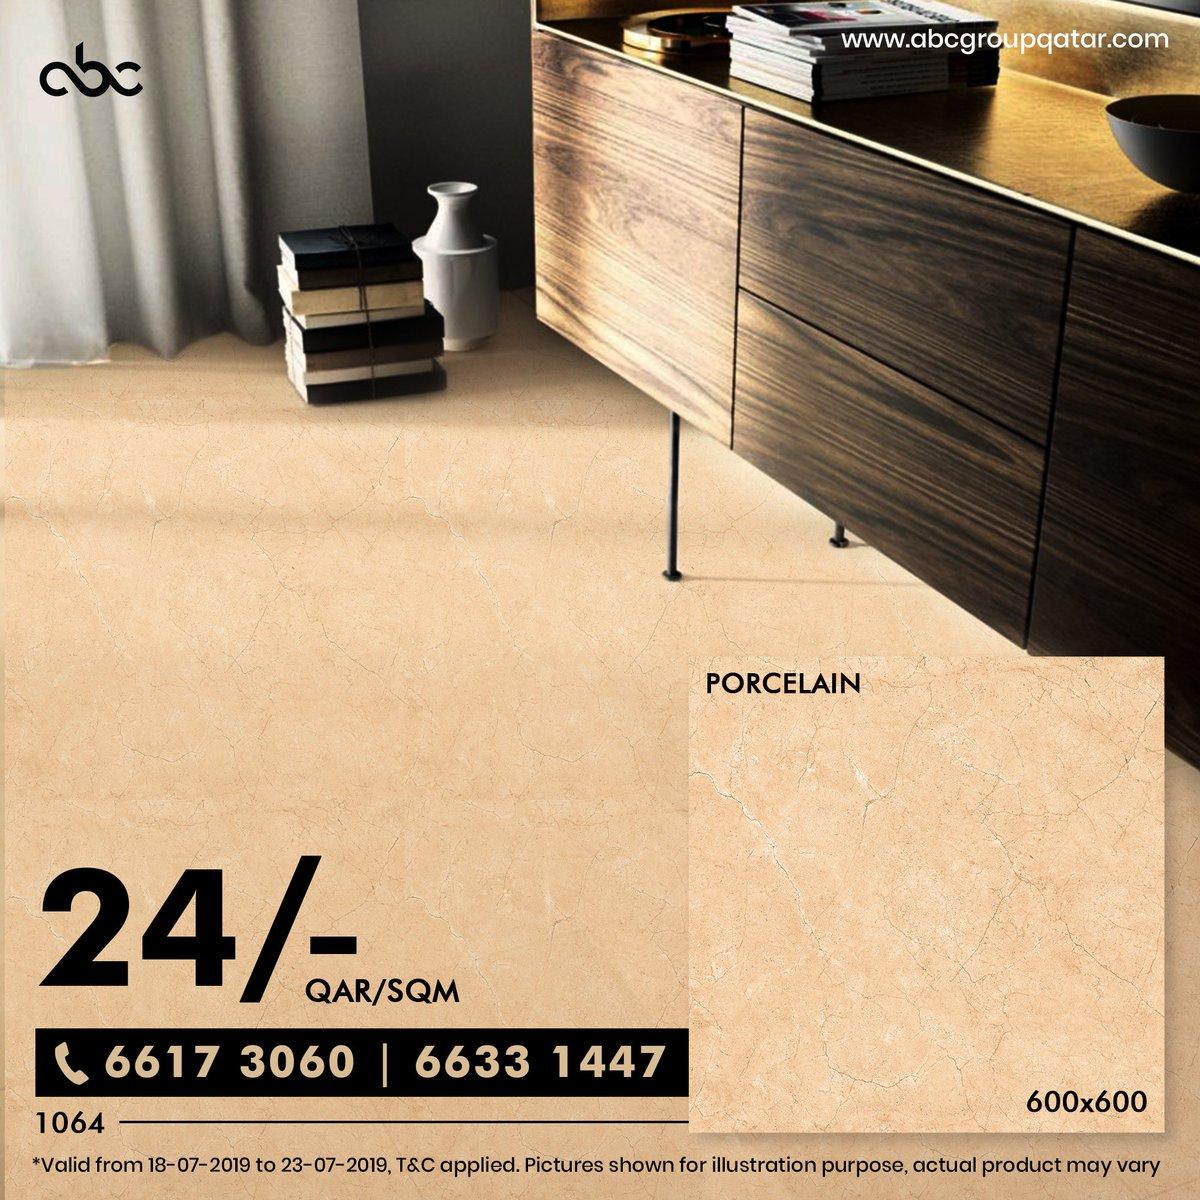 Best Price 600*600 Porcelain floor tile for just 24/-QAR